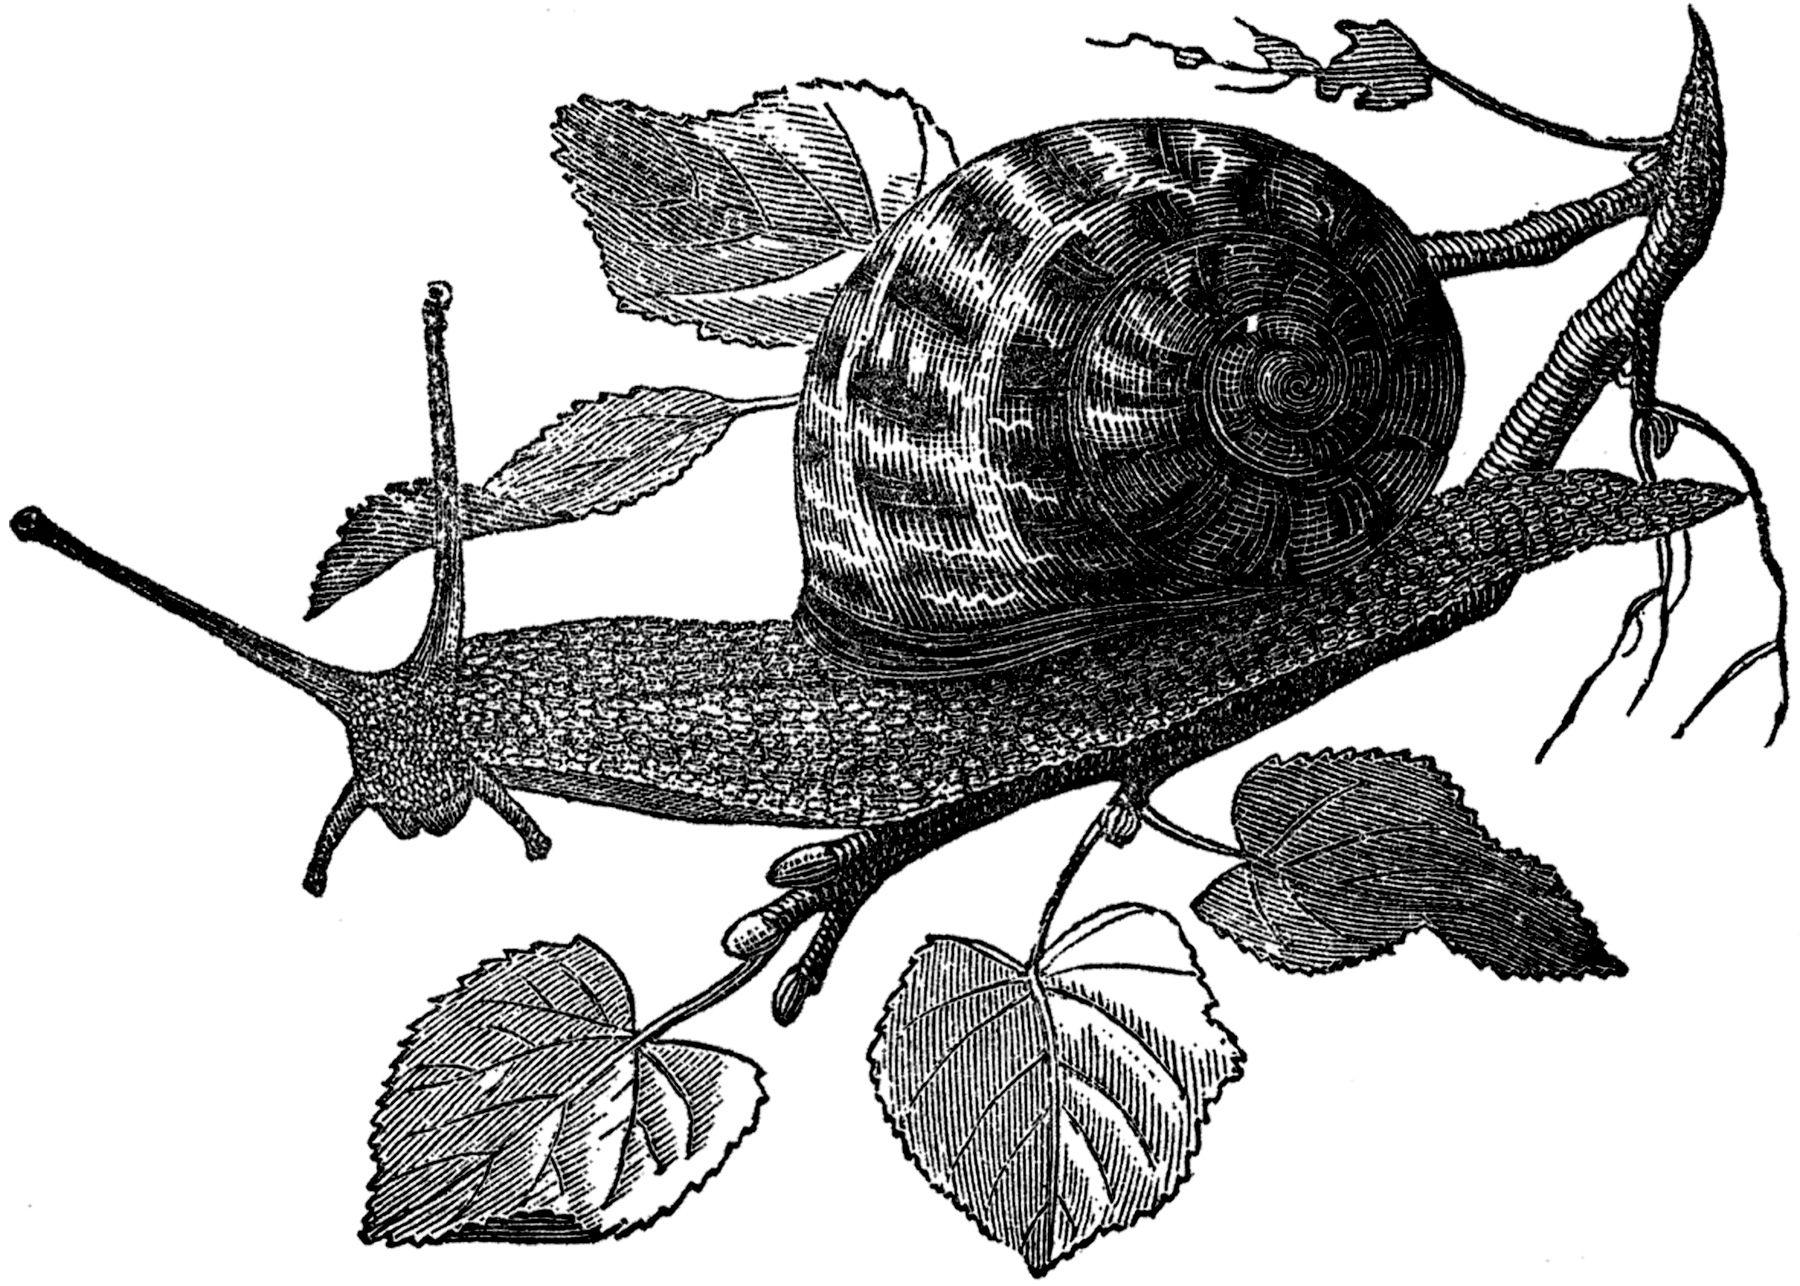 Free Public Domain Snail Images - The Graphics Fairy